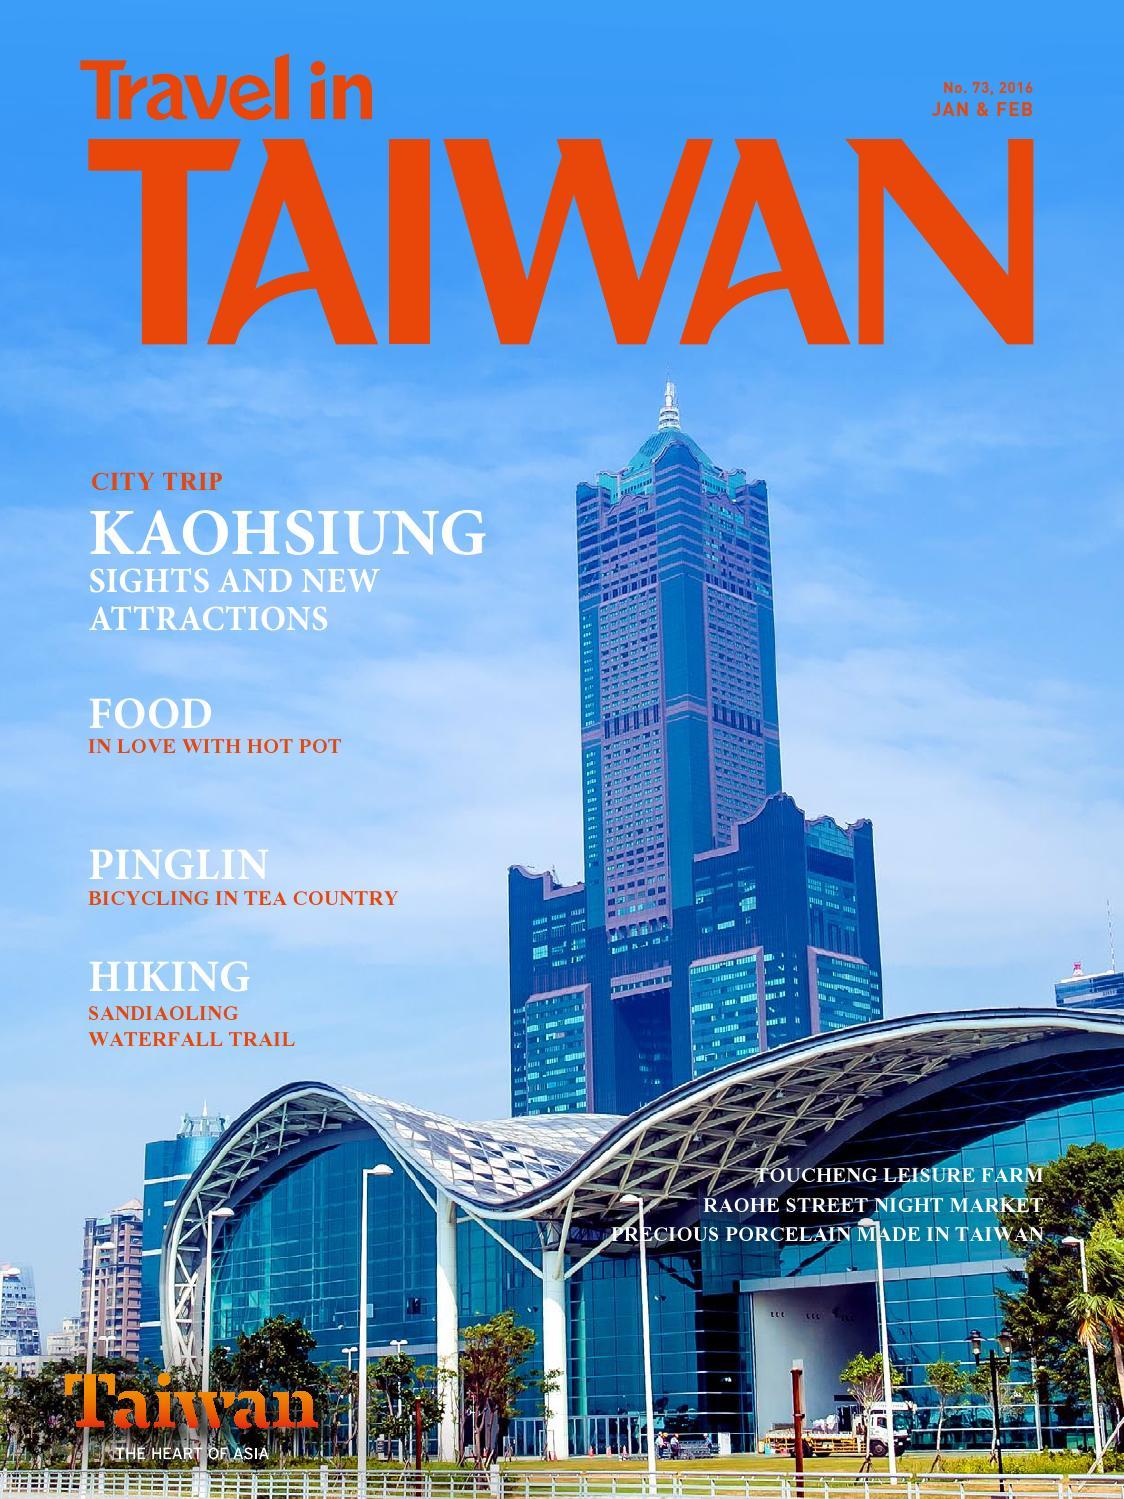 travel in taiwan no 73 2016 1 2 by travel in taiwan issuu rh issuu com